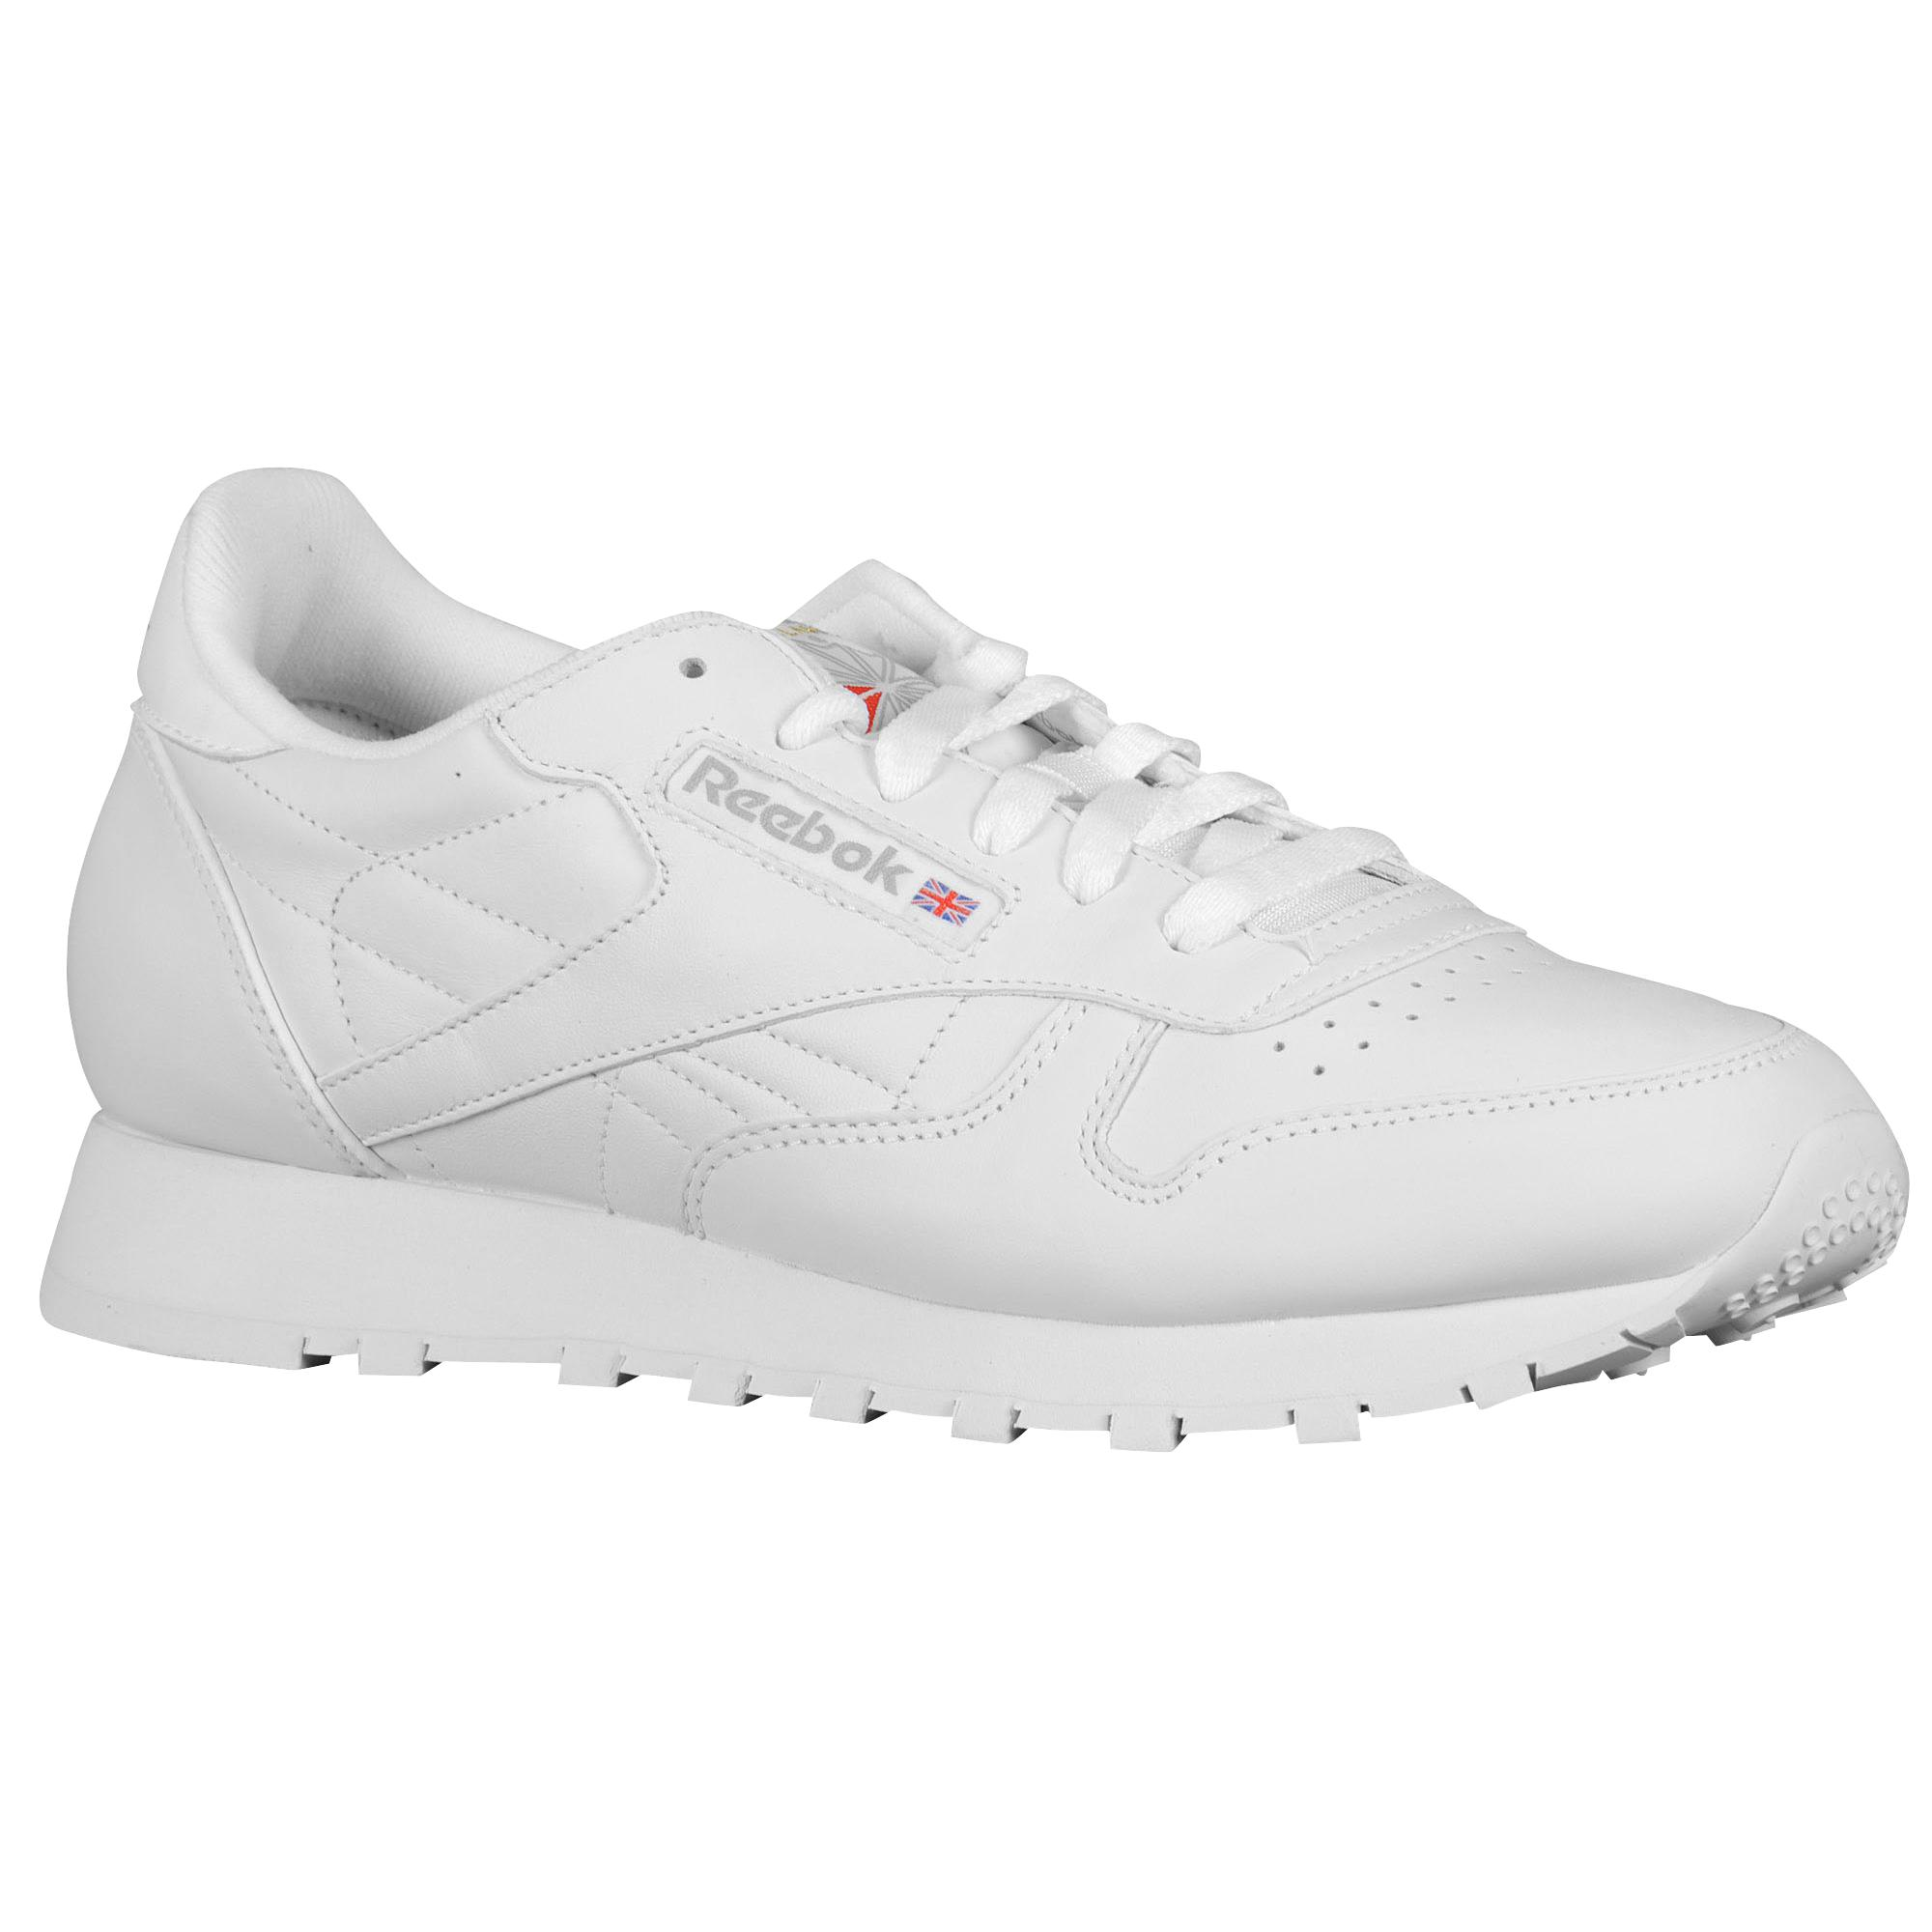 234bc4216e7 Reebok - White Classic Leather - Lyst. View fullscreen